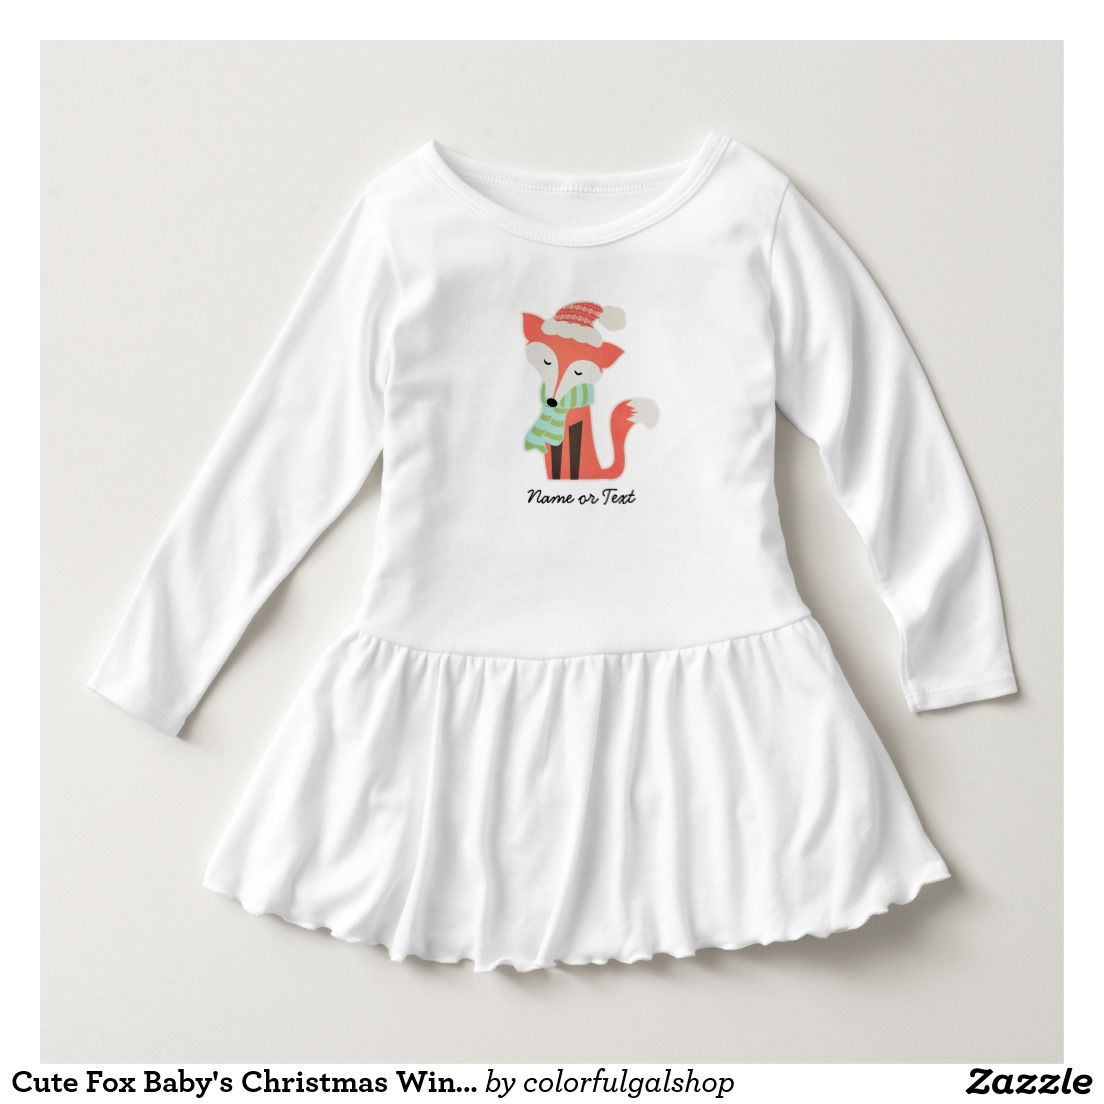 Cute Fox Babyus Christmas Winter Woodland Rustic Shirts  Baby